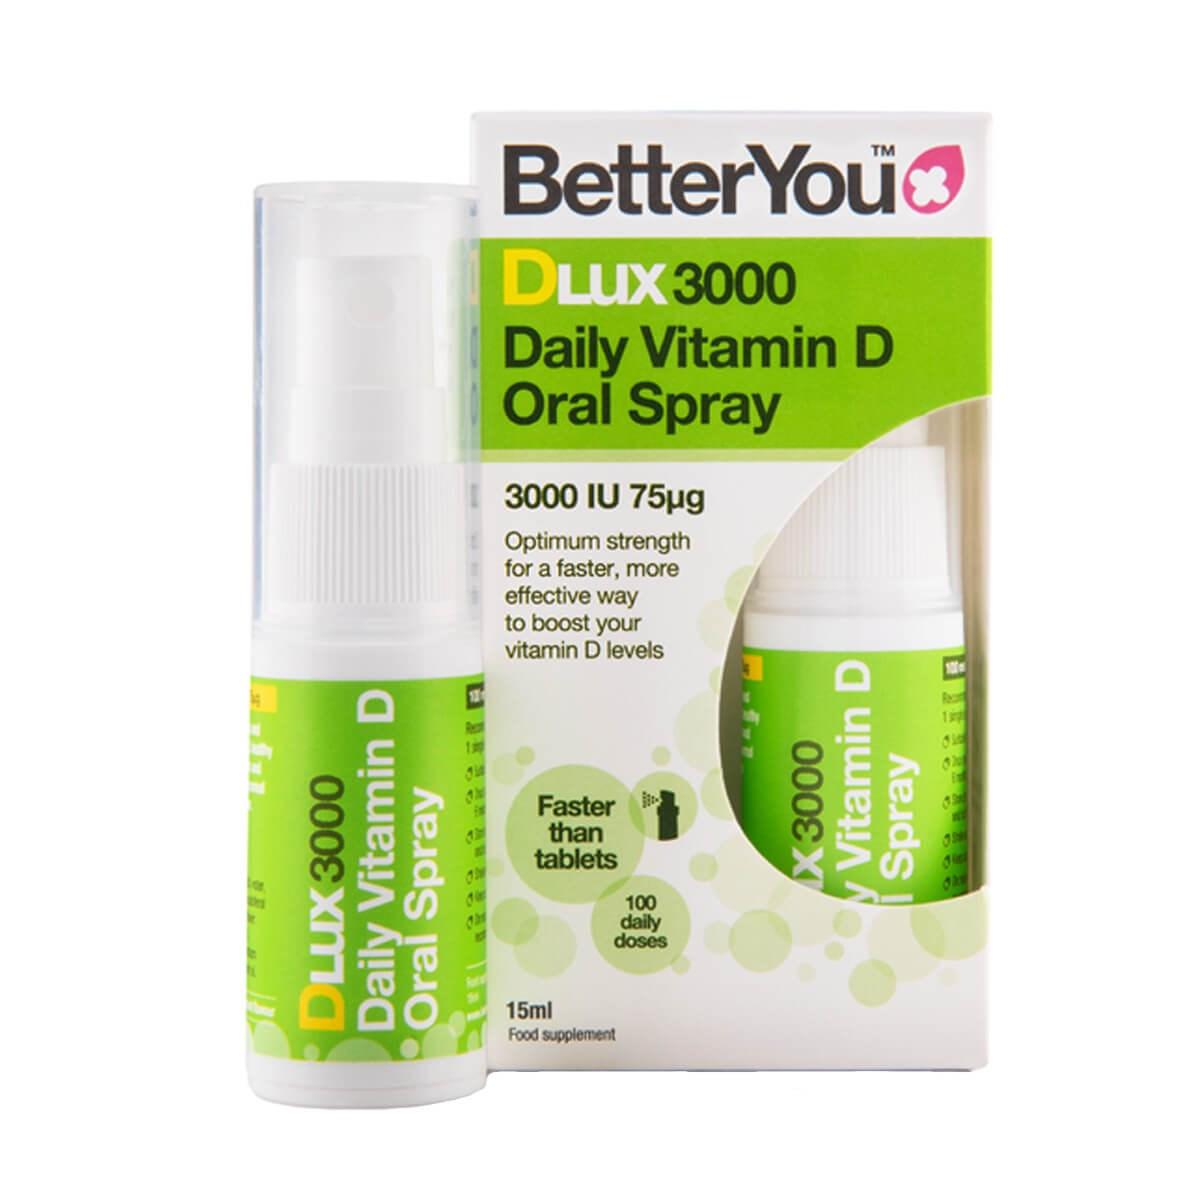 BetterYou DLux3000 Oral Vitamin D3 Spray